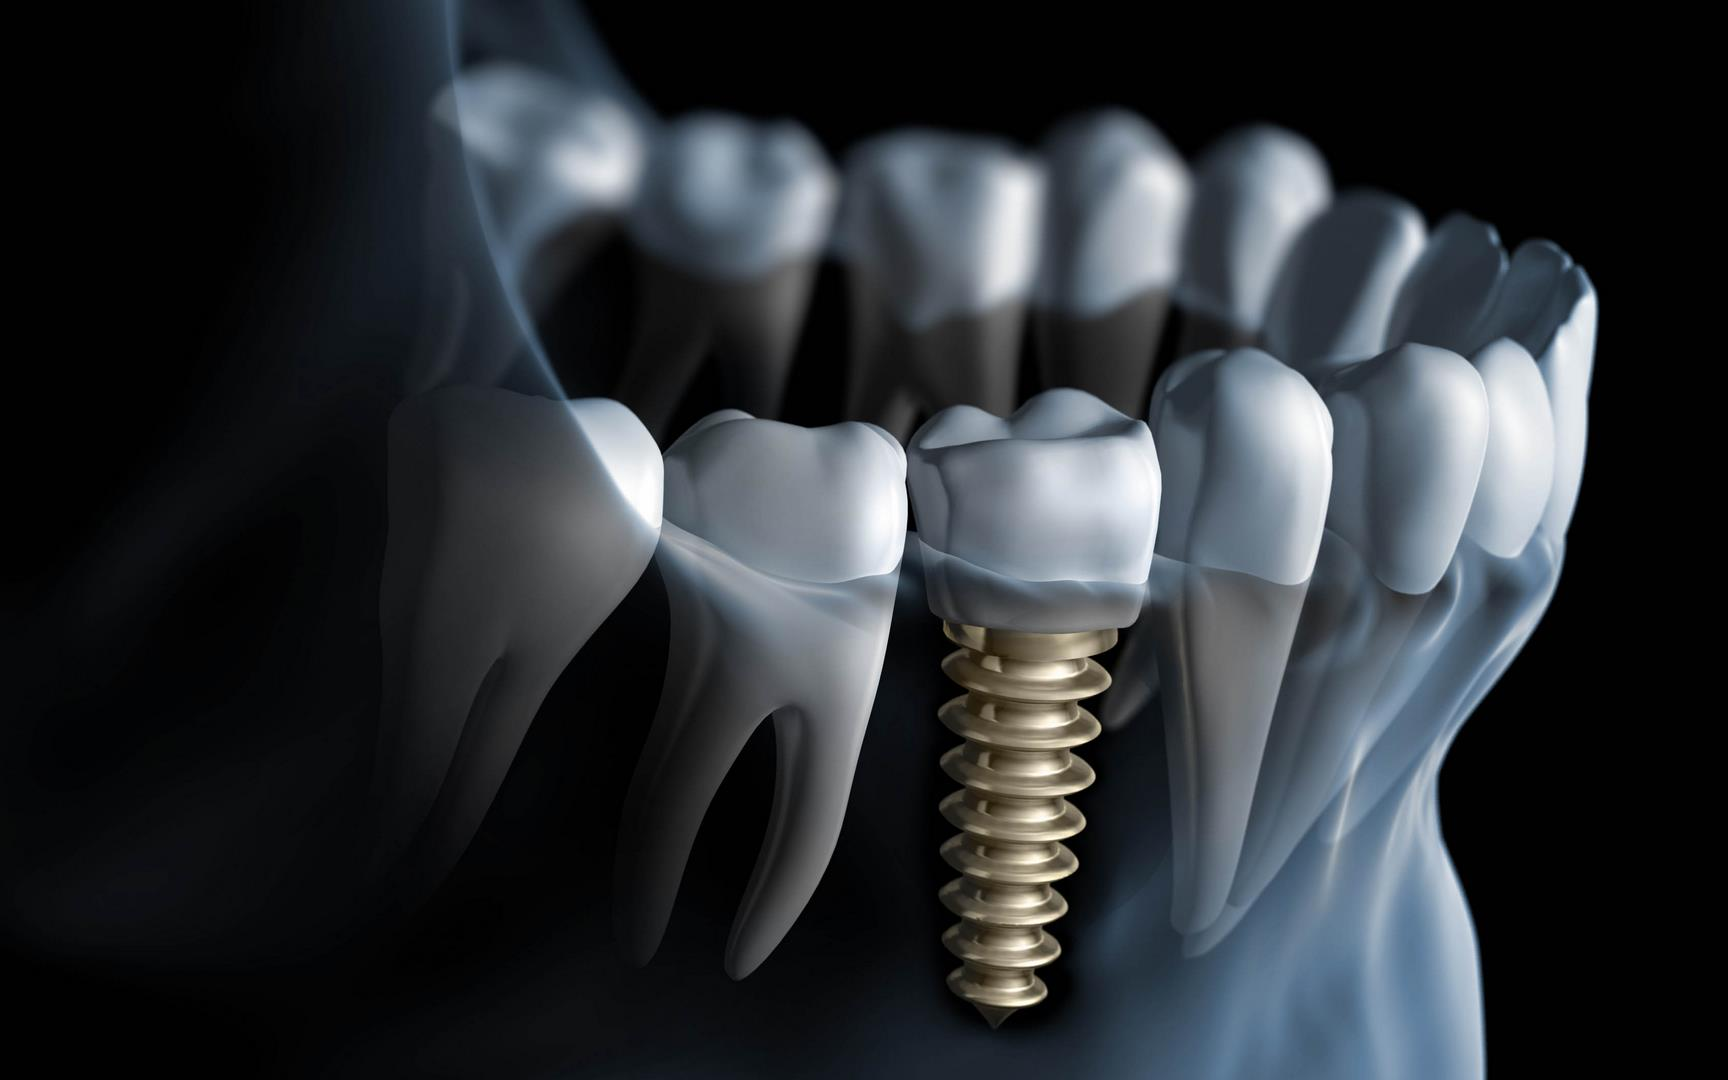 Hayouma-Ninael-dentiste-13005-implants-dentaires-1